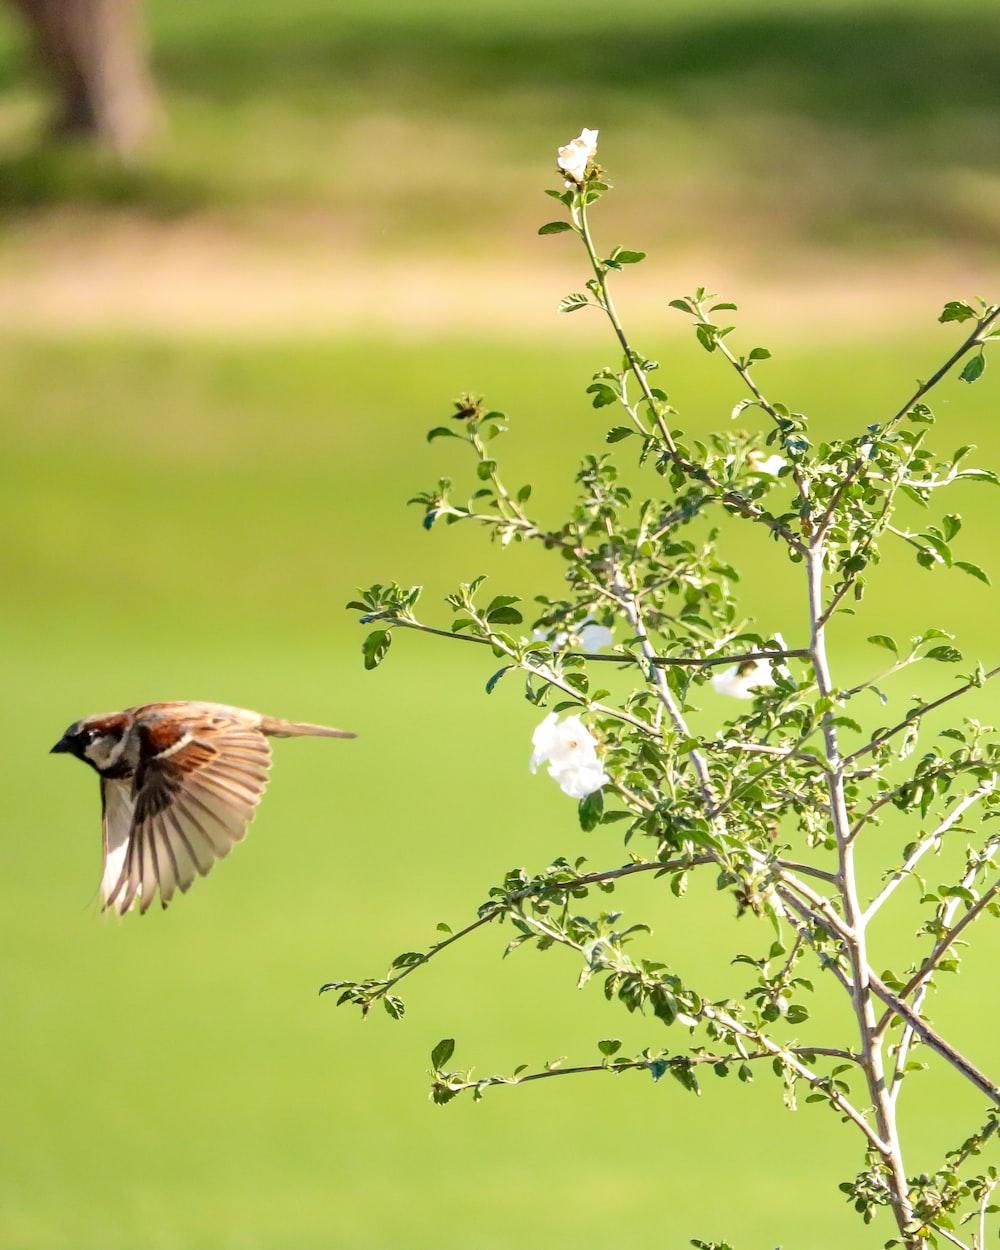 brown and black bird on white flower during daytime